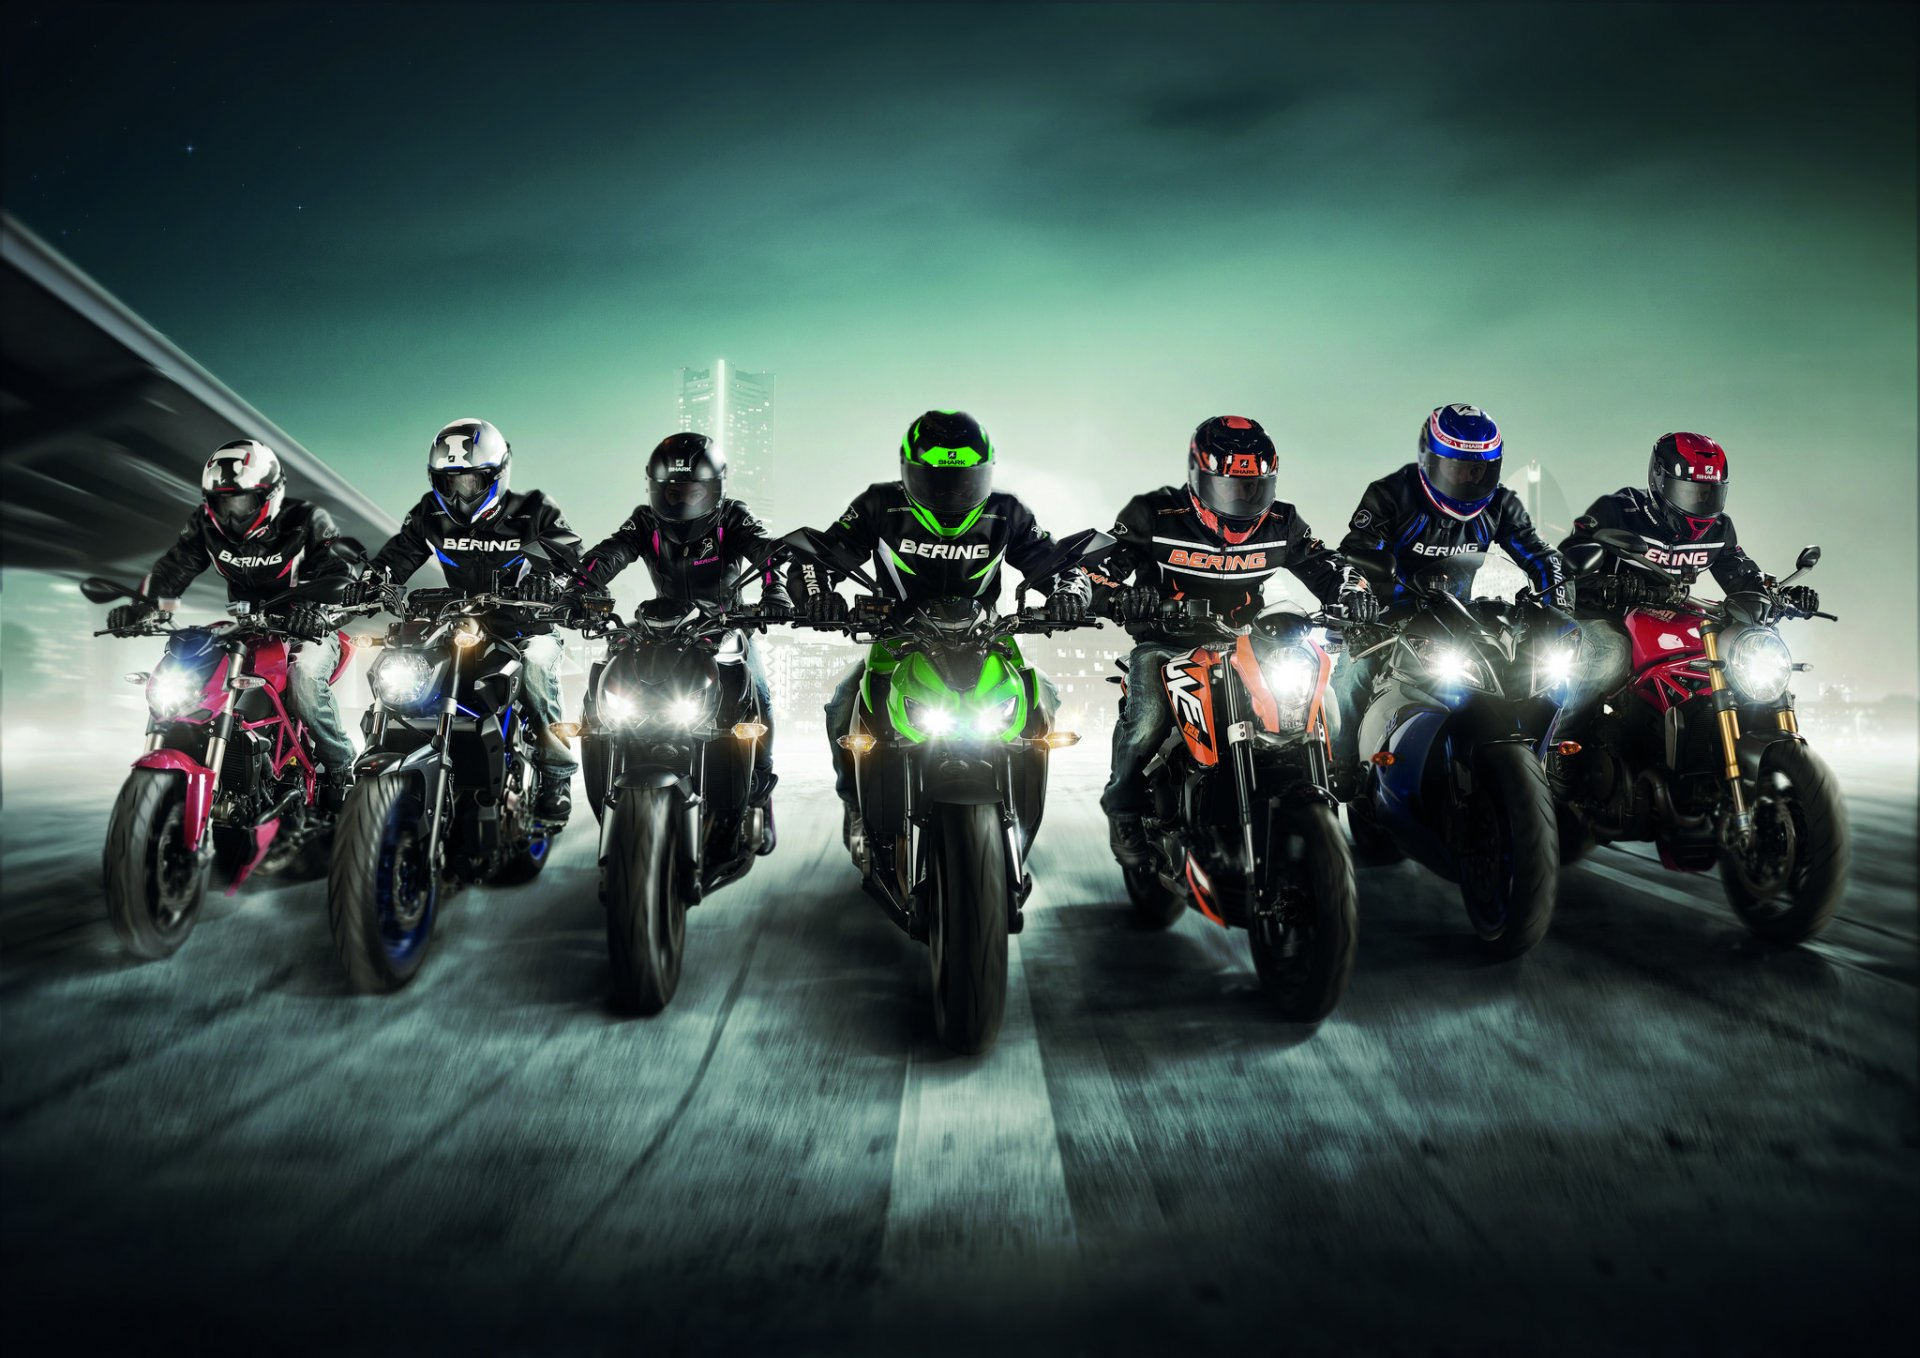 может картинки для группы про мотоциклы модели